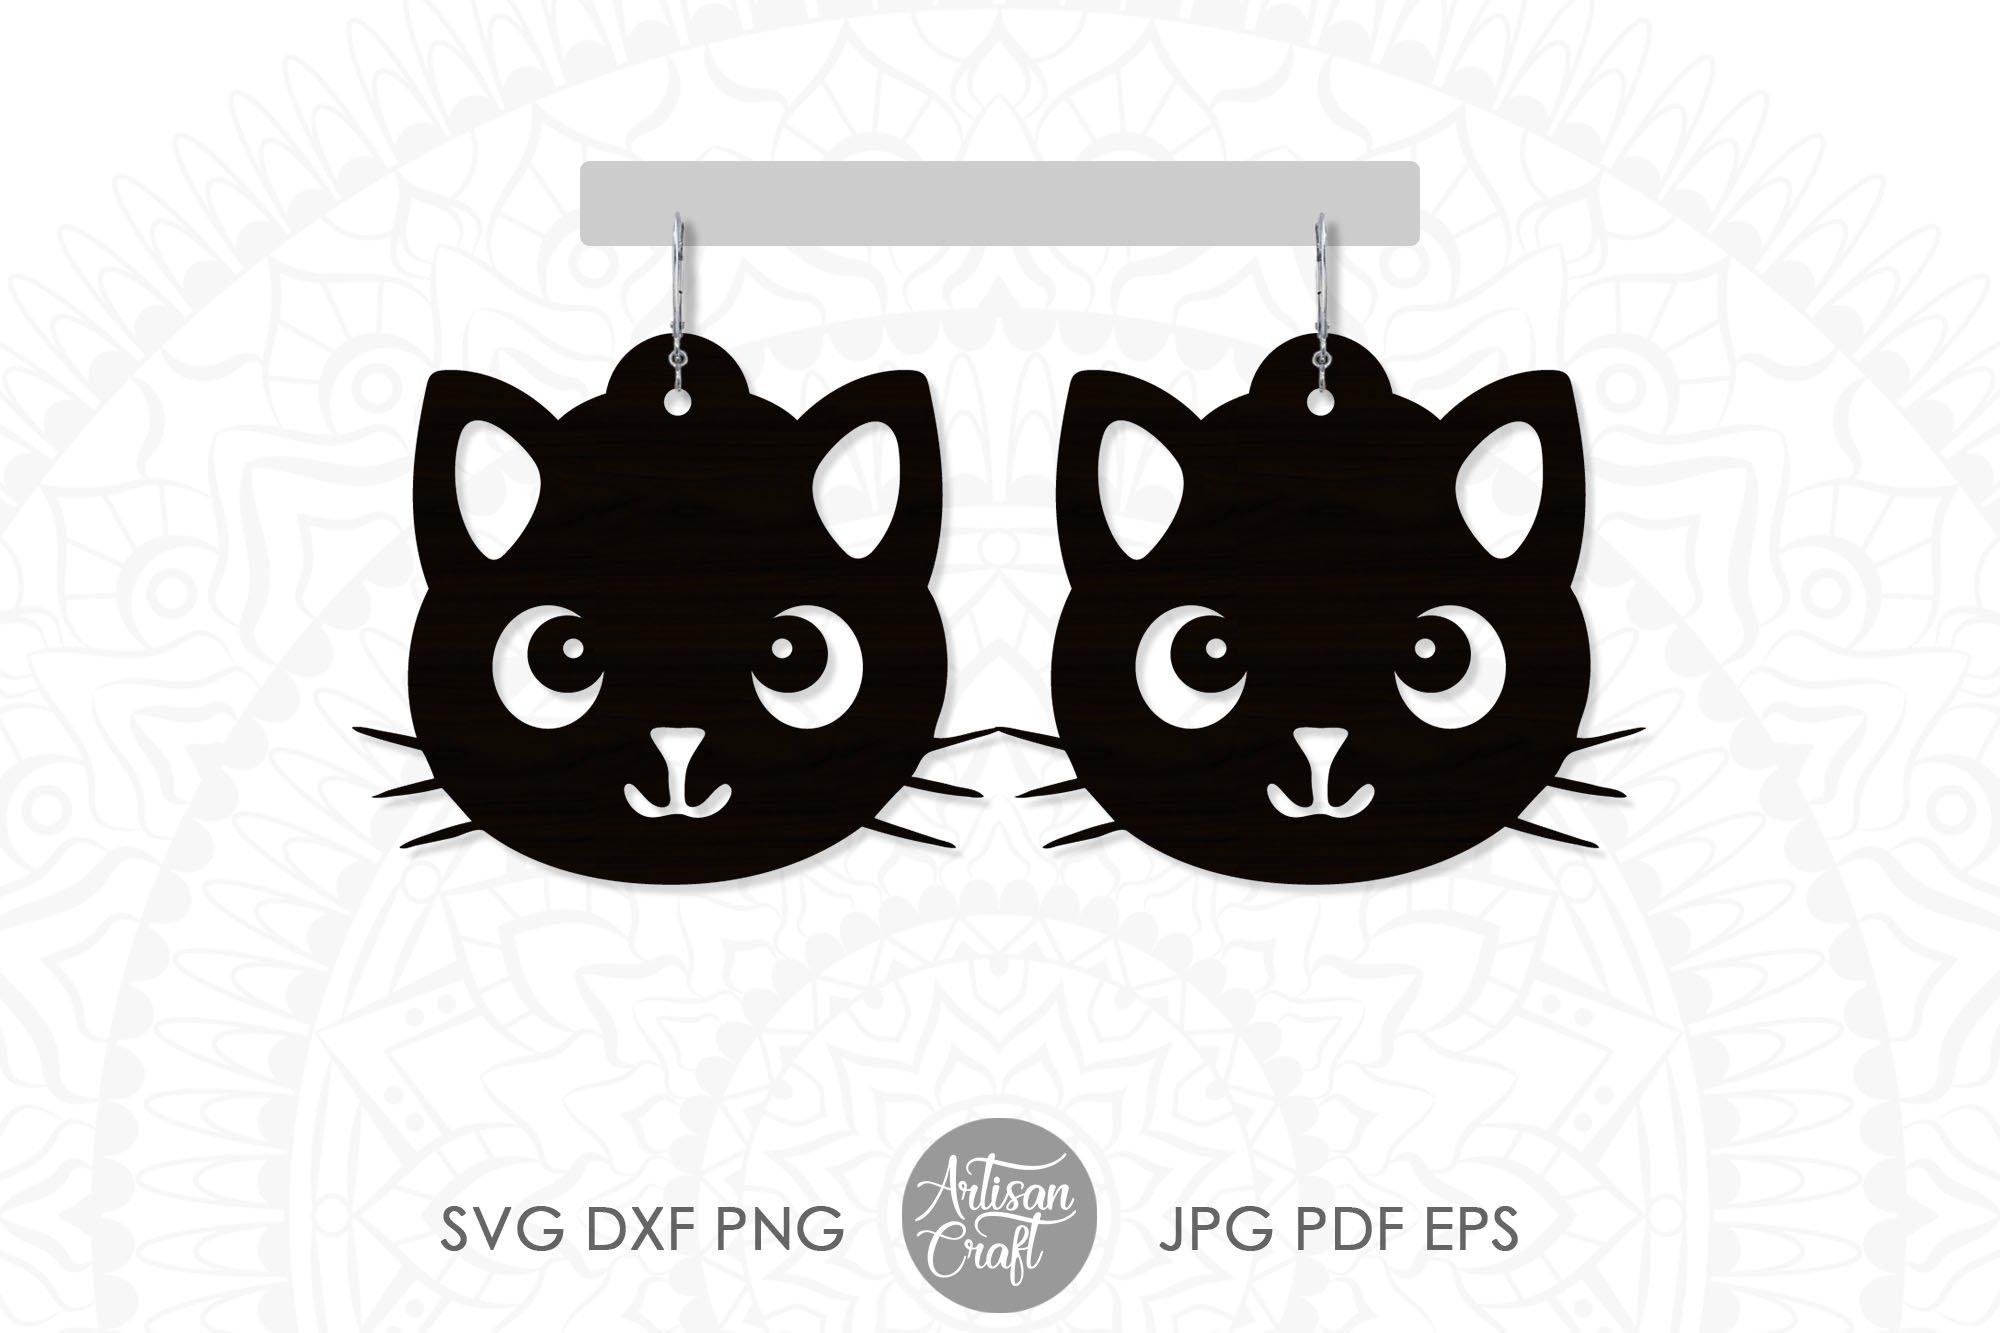 Cat earrings, svg, earrings for kids, cute cat earrings example image 1